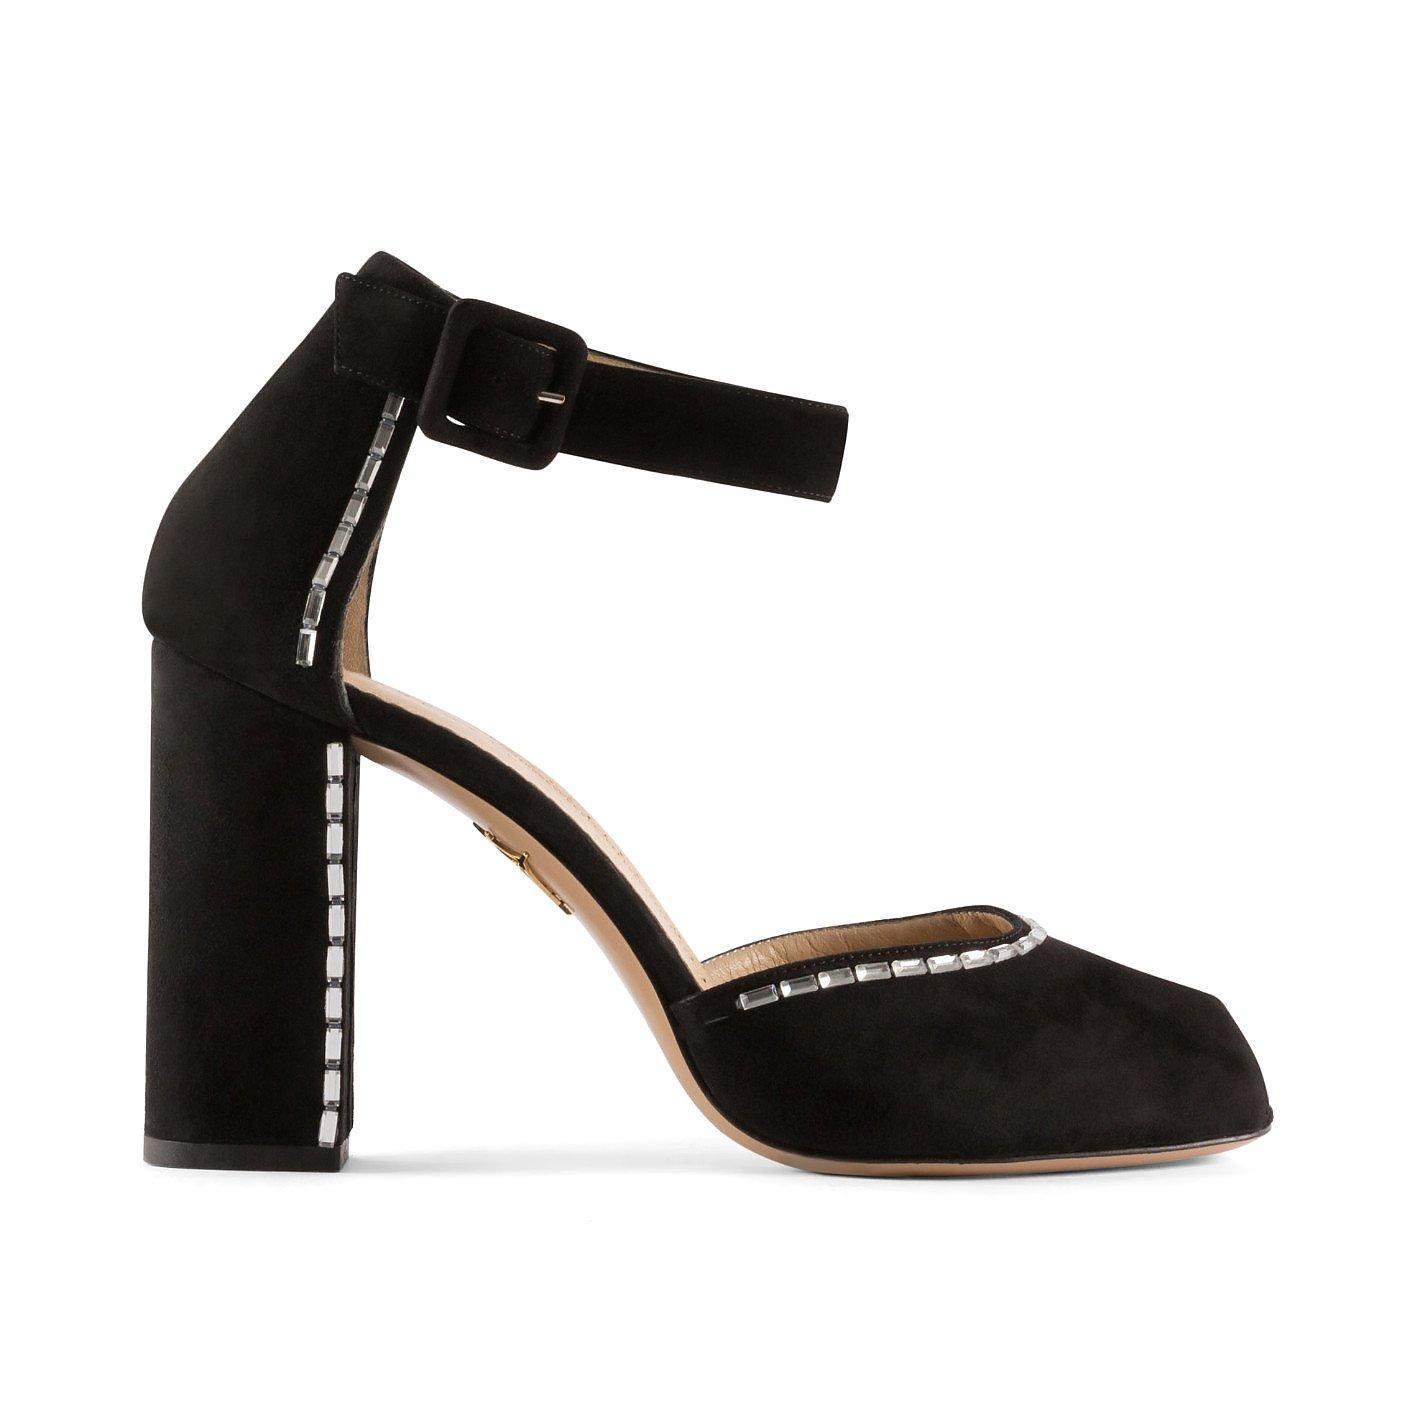 Charlotte Olympia Embellished Peep-Toe Heeled Sandals